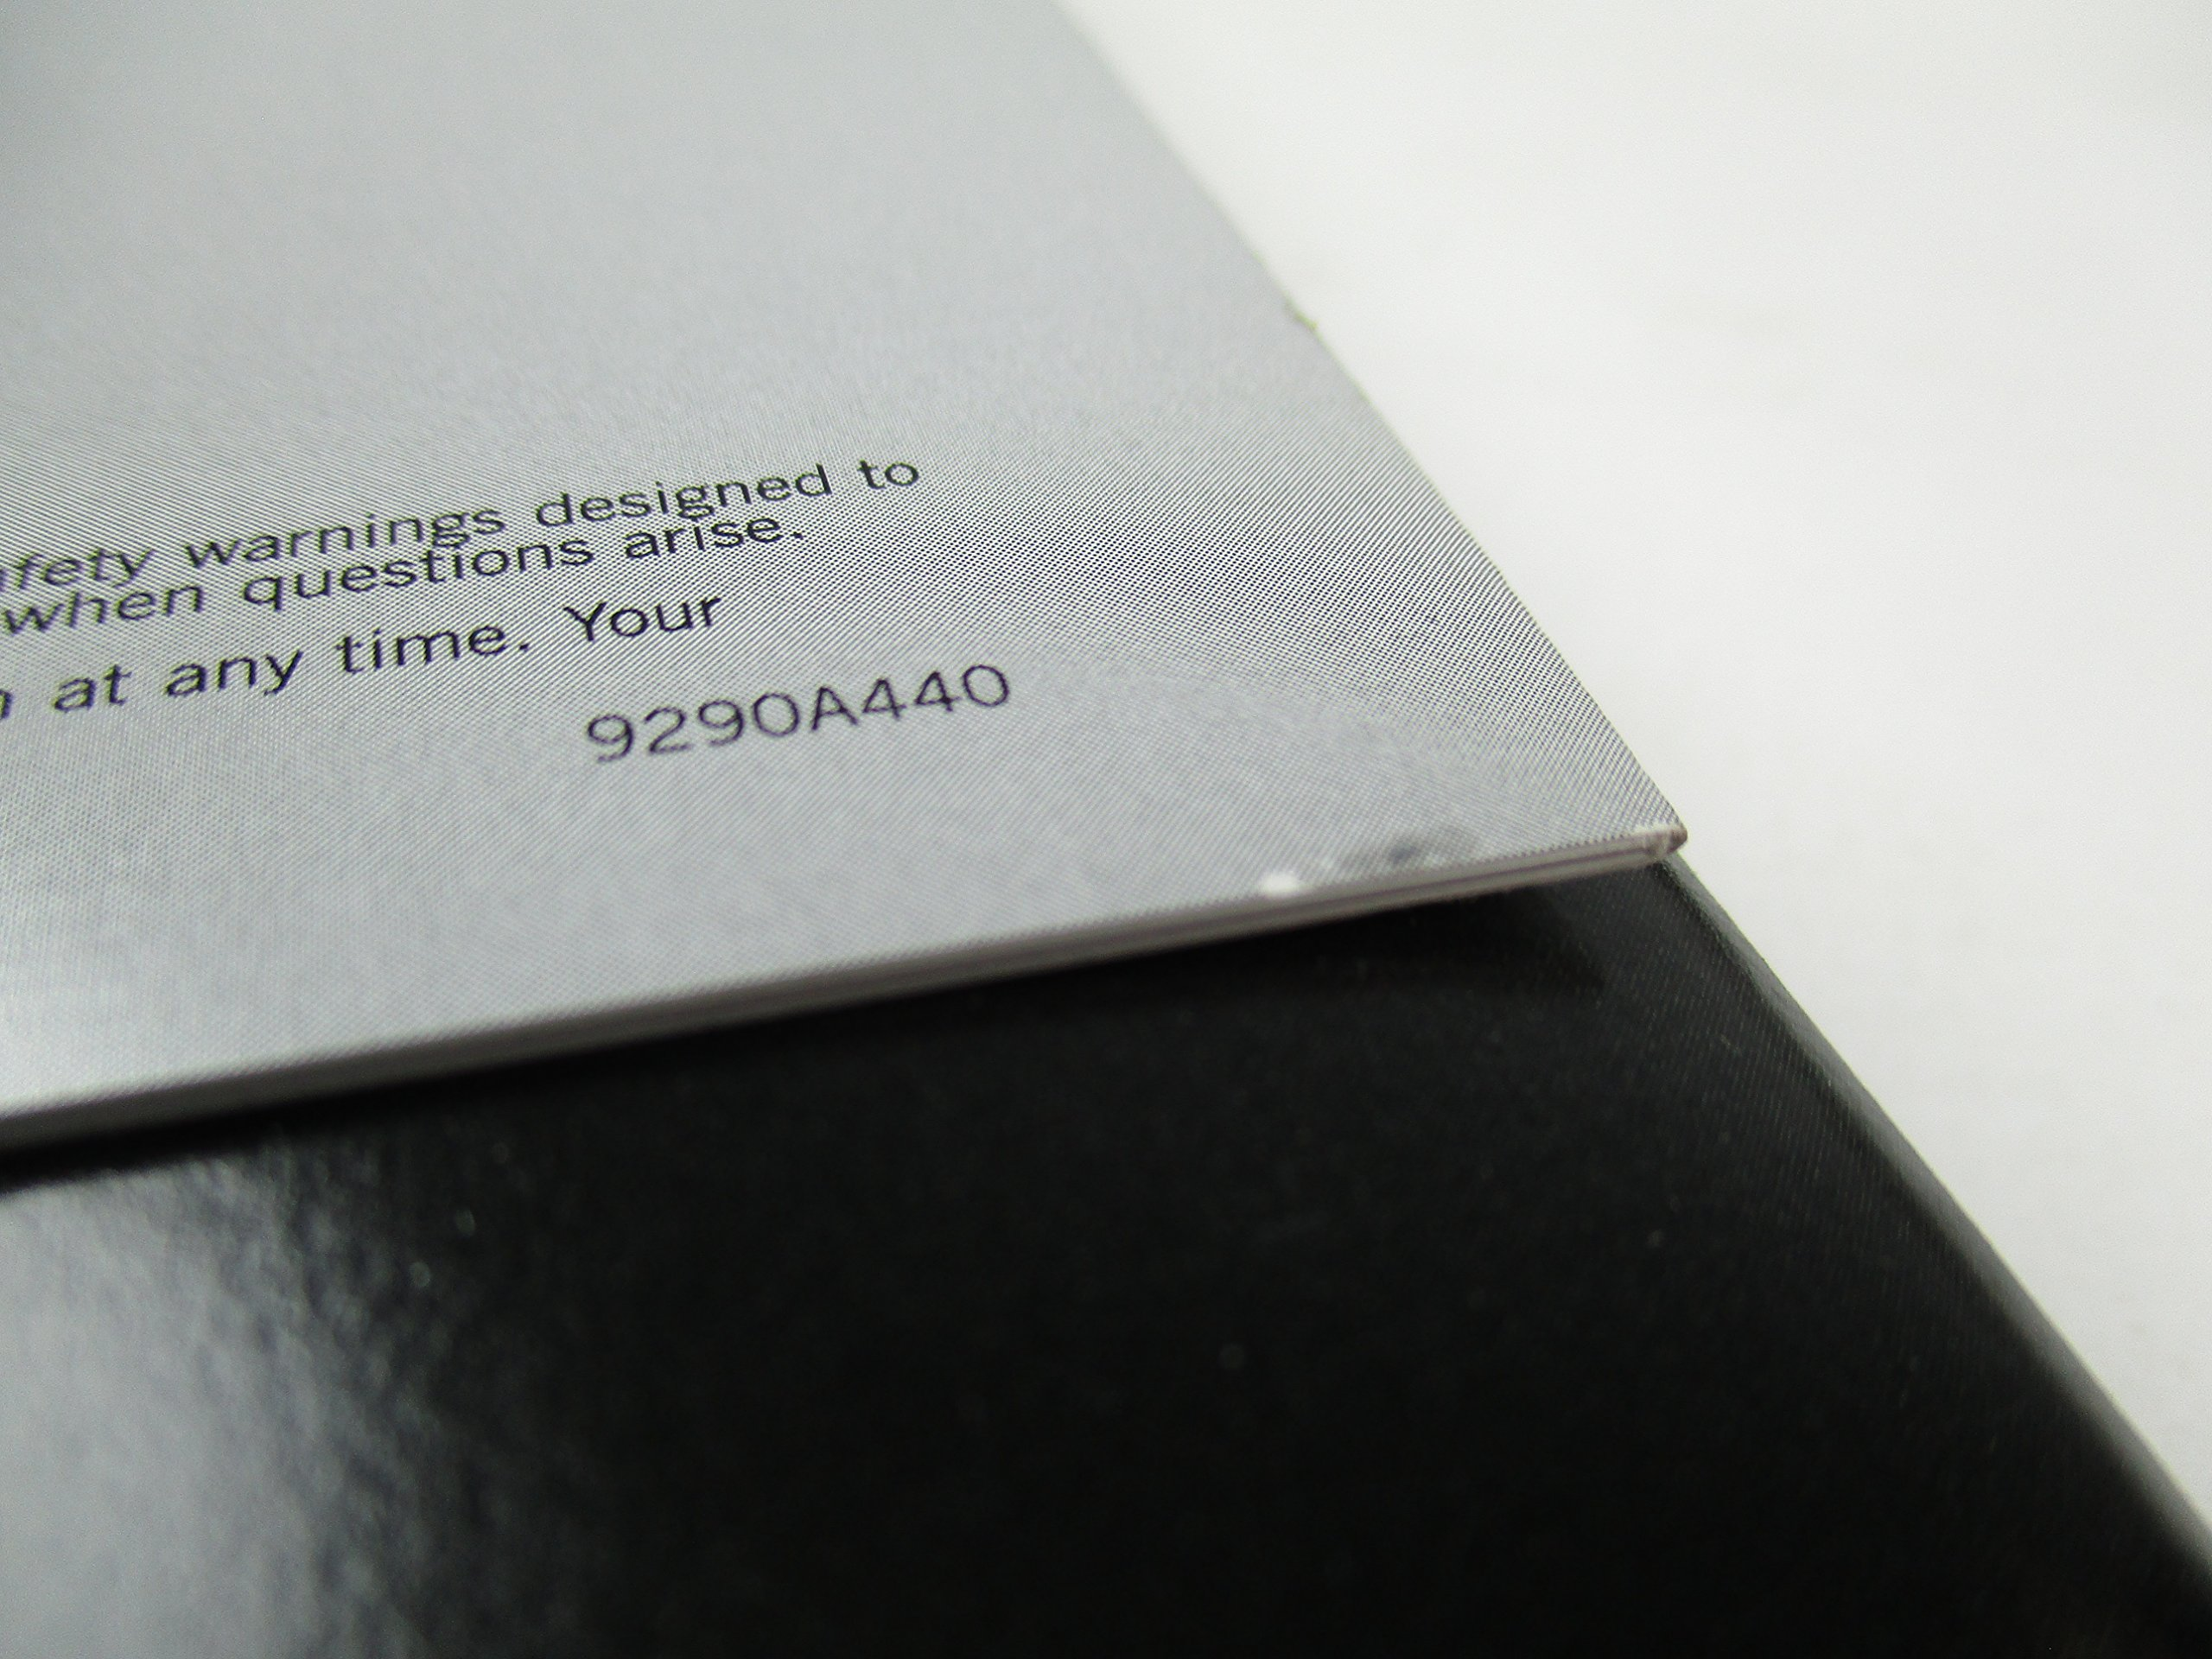 2005 mitsubishi galant manual ebook ebook tempower us array 2005 mitsubishi galant owners manual mitsubishi amazon com books rh amazon fandeluxe Gallery